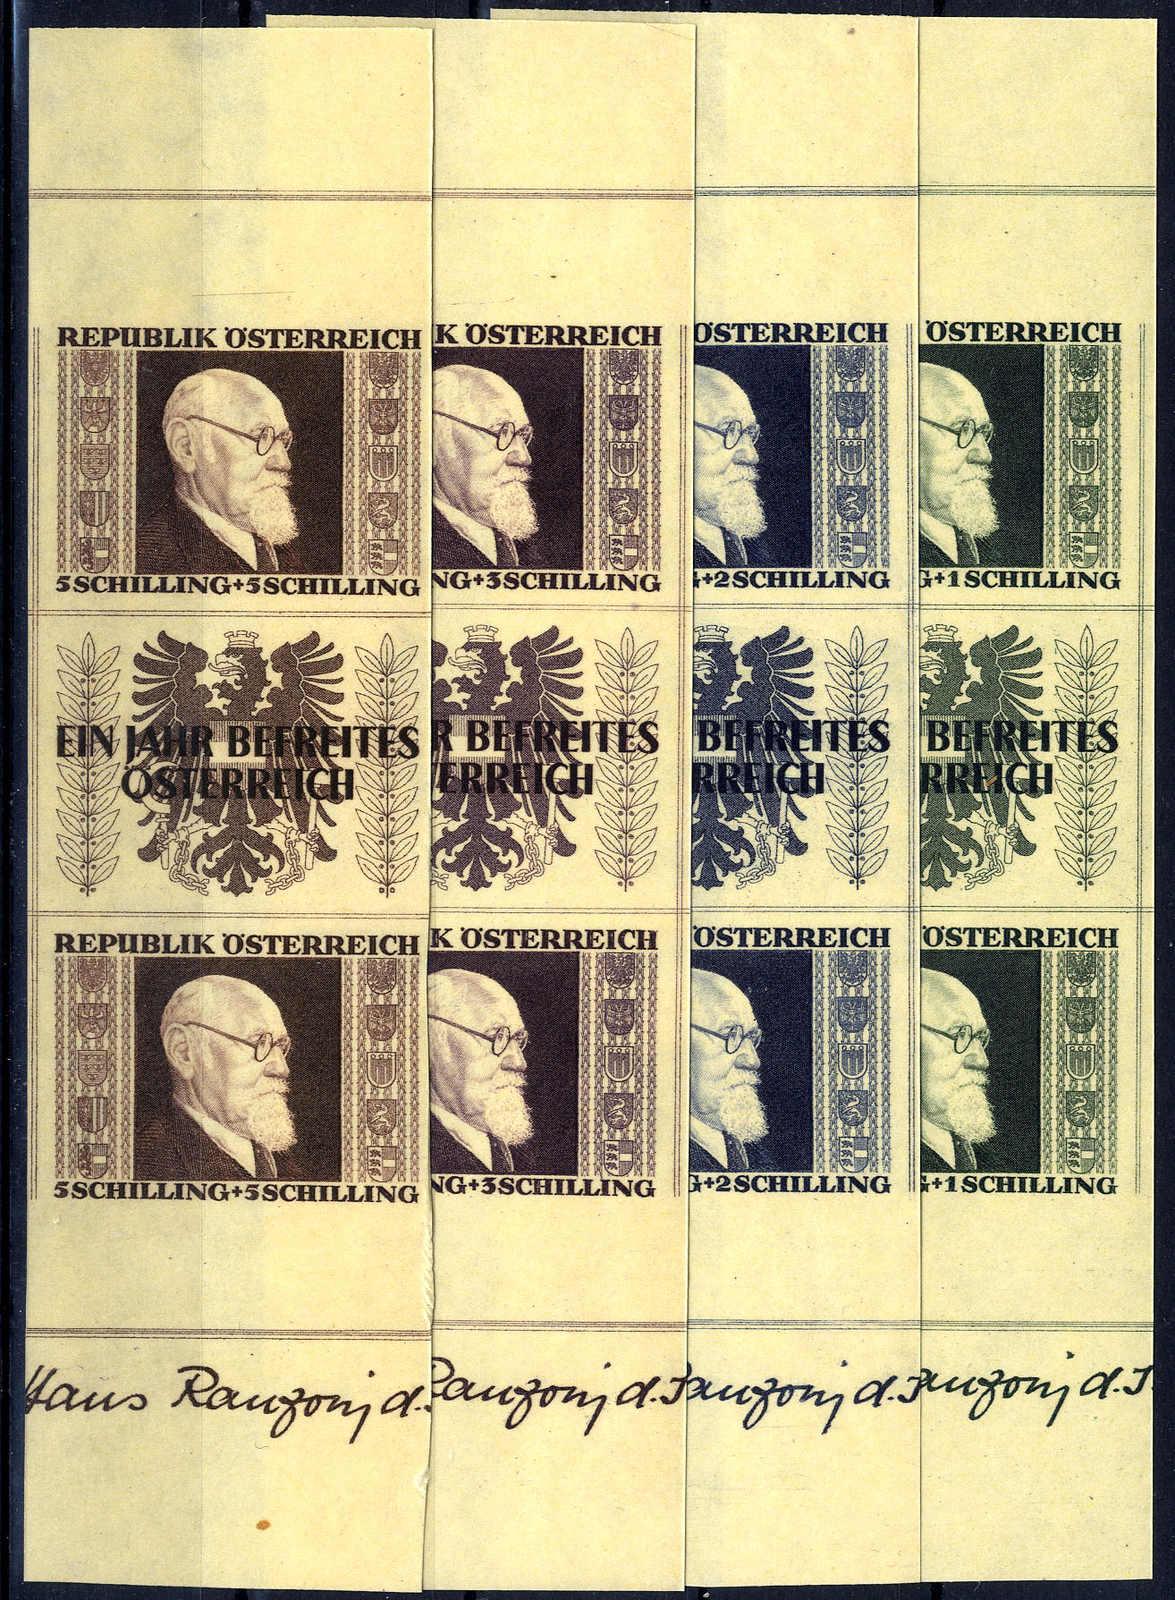 Lot 2416 - europe Austria 2nd. Republic -  Viennafil Auktionen 63rd LIVE AUCTION